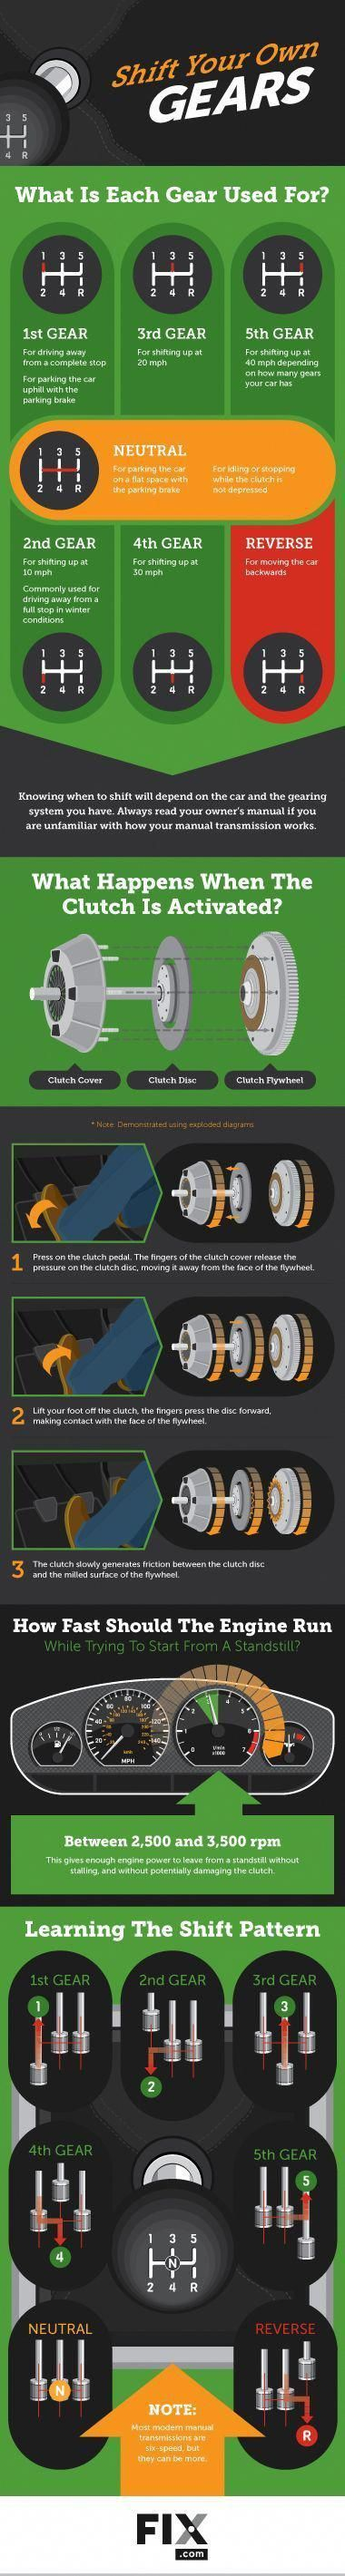 Driving A Manual Transmission Fix Com Learning To Drive Manual Car Car Mechanic